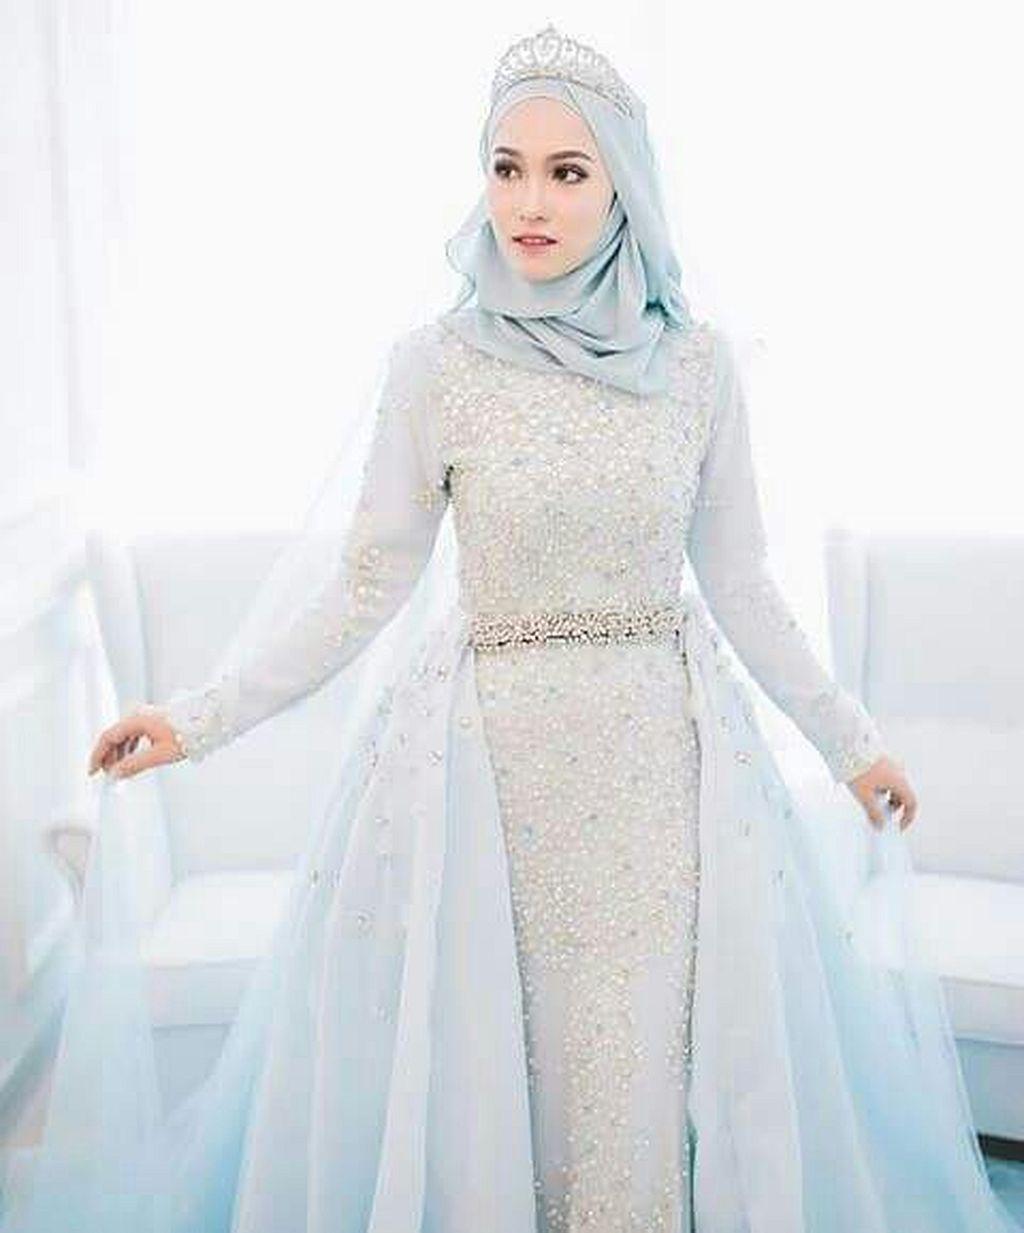 wedding moslem dress inspiration dress ideas wedding wear and